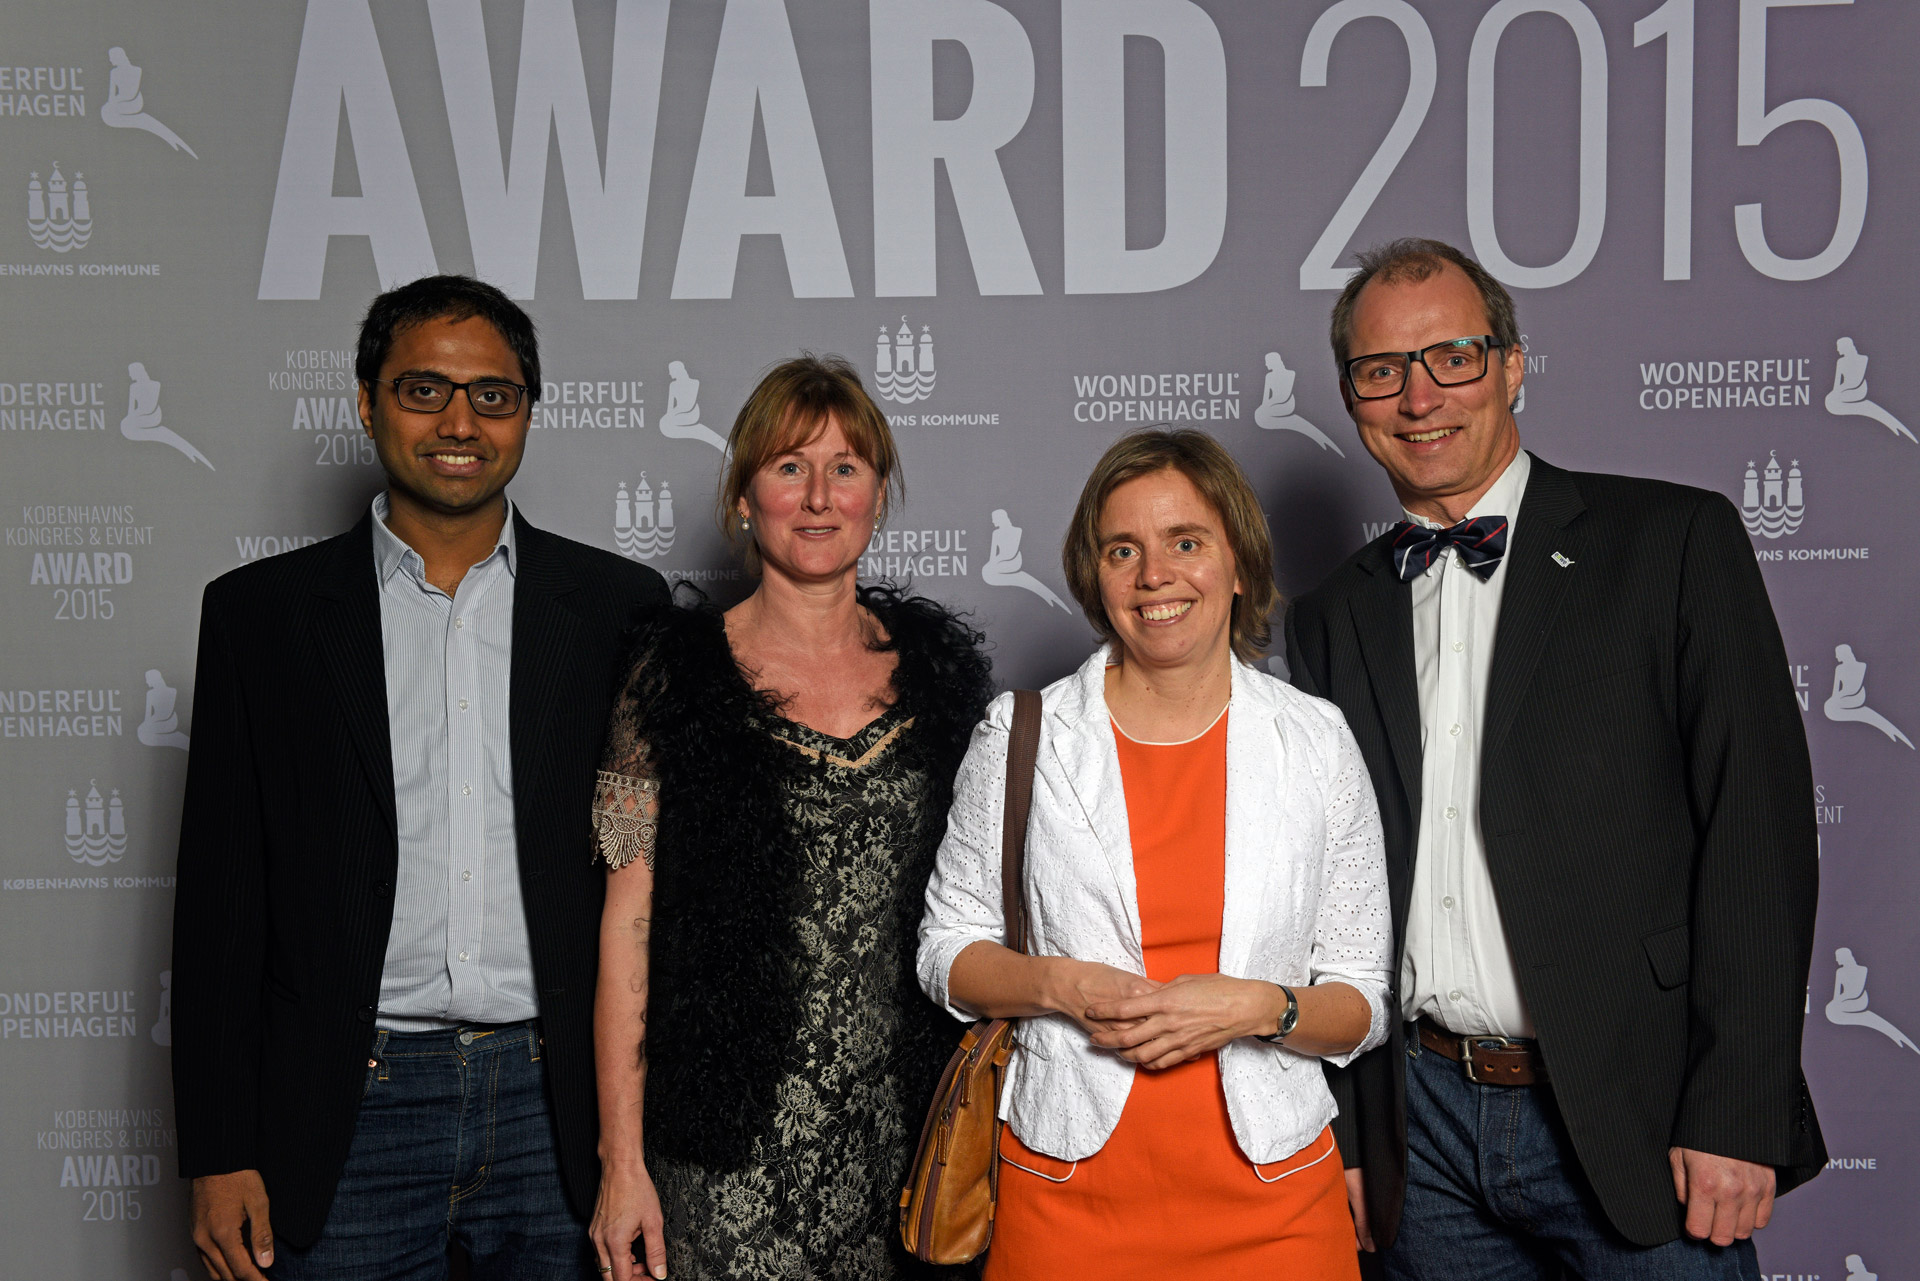 Københavns Kongres & Event Award 2015 by Wonderful Copenhagen